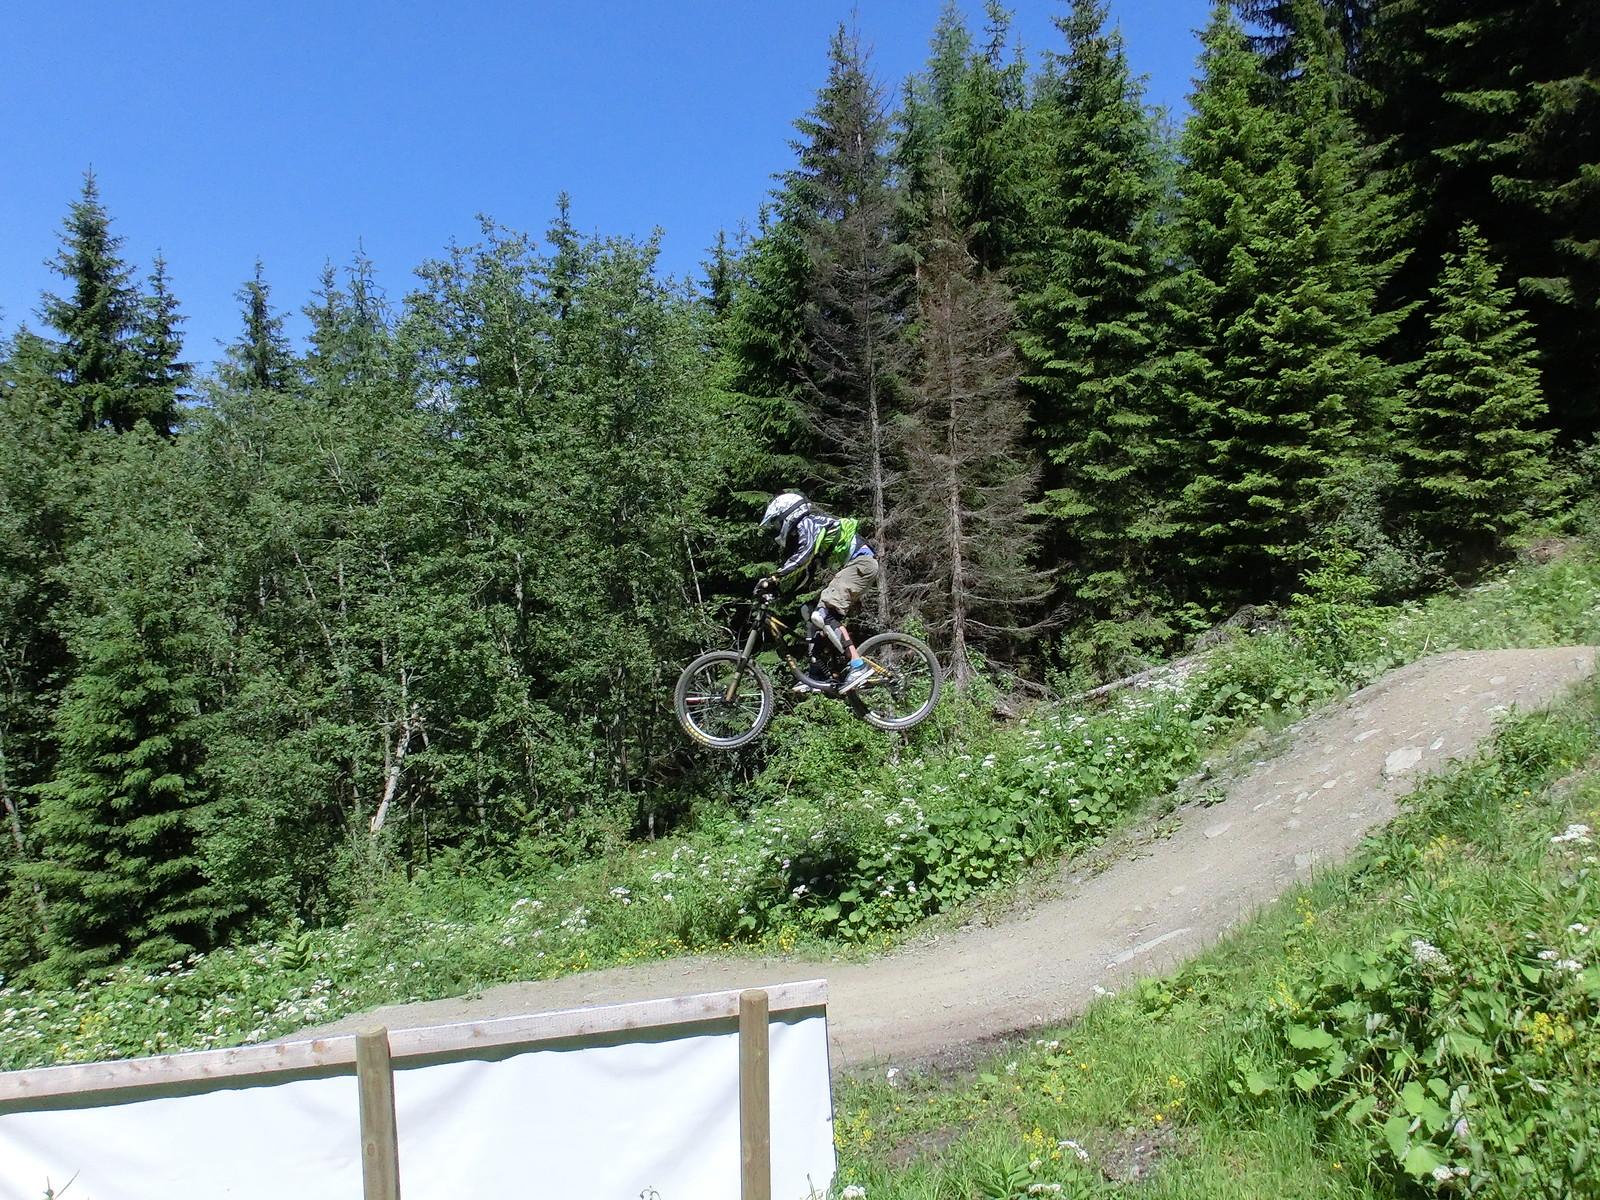 CIMG0733 - wendelin.hirzberger - Mountain Biking Pictures - Vital MTB